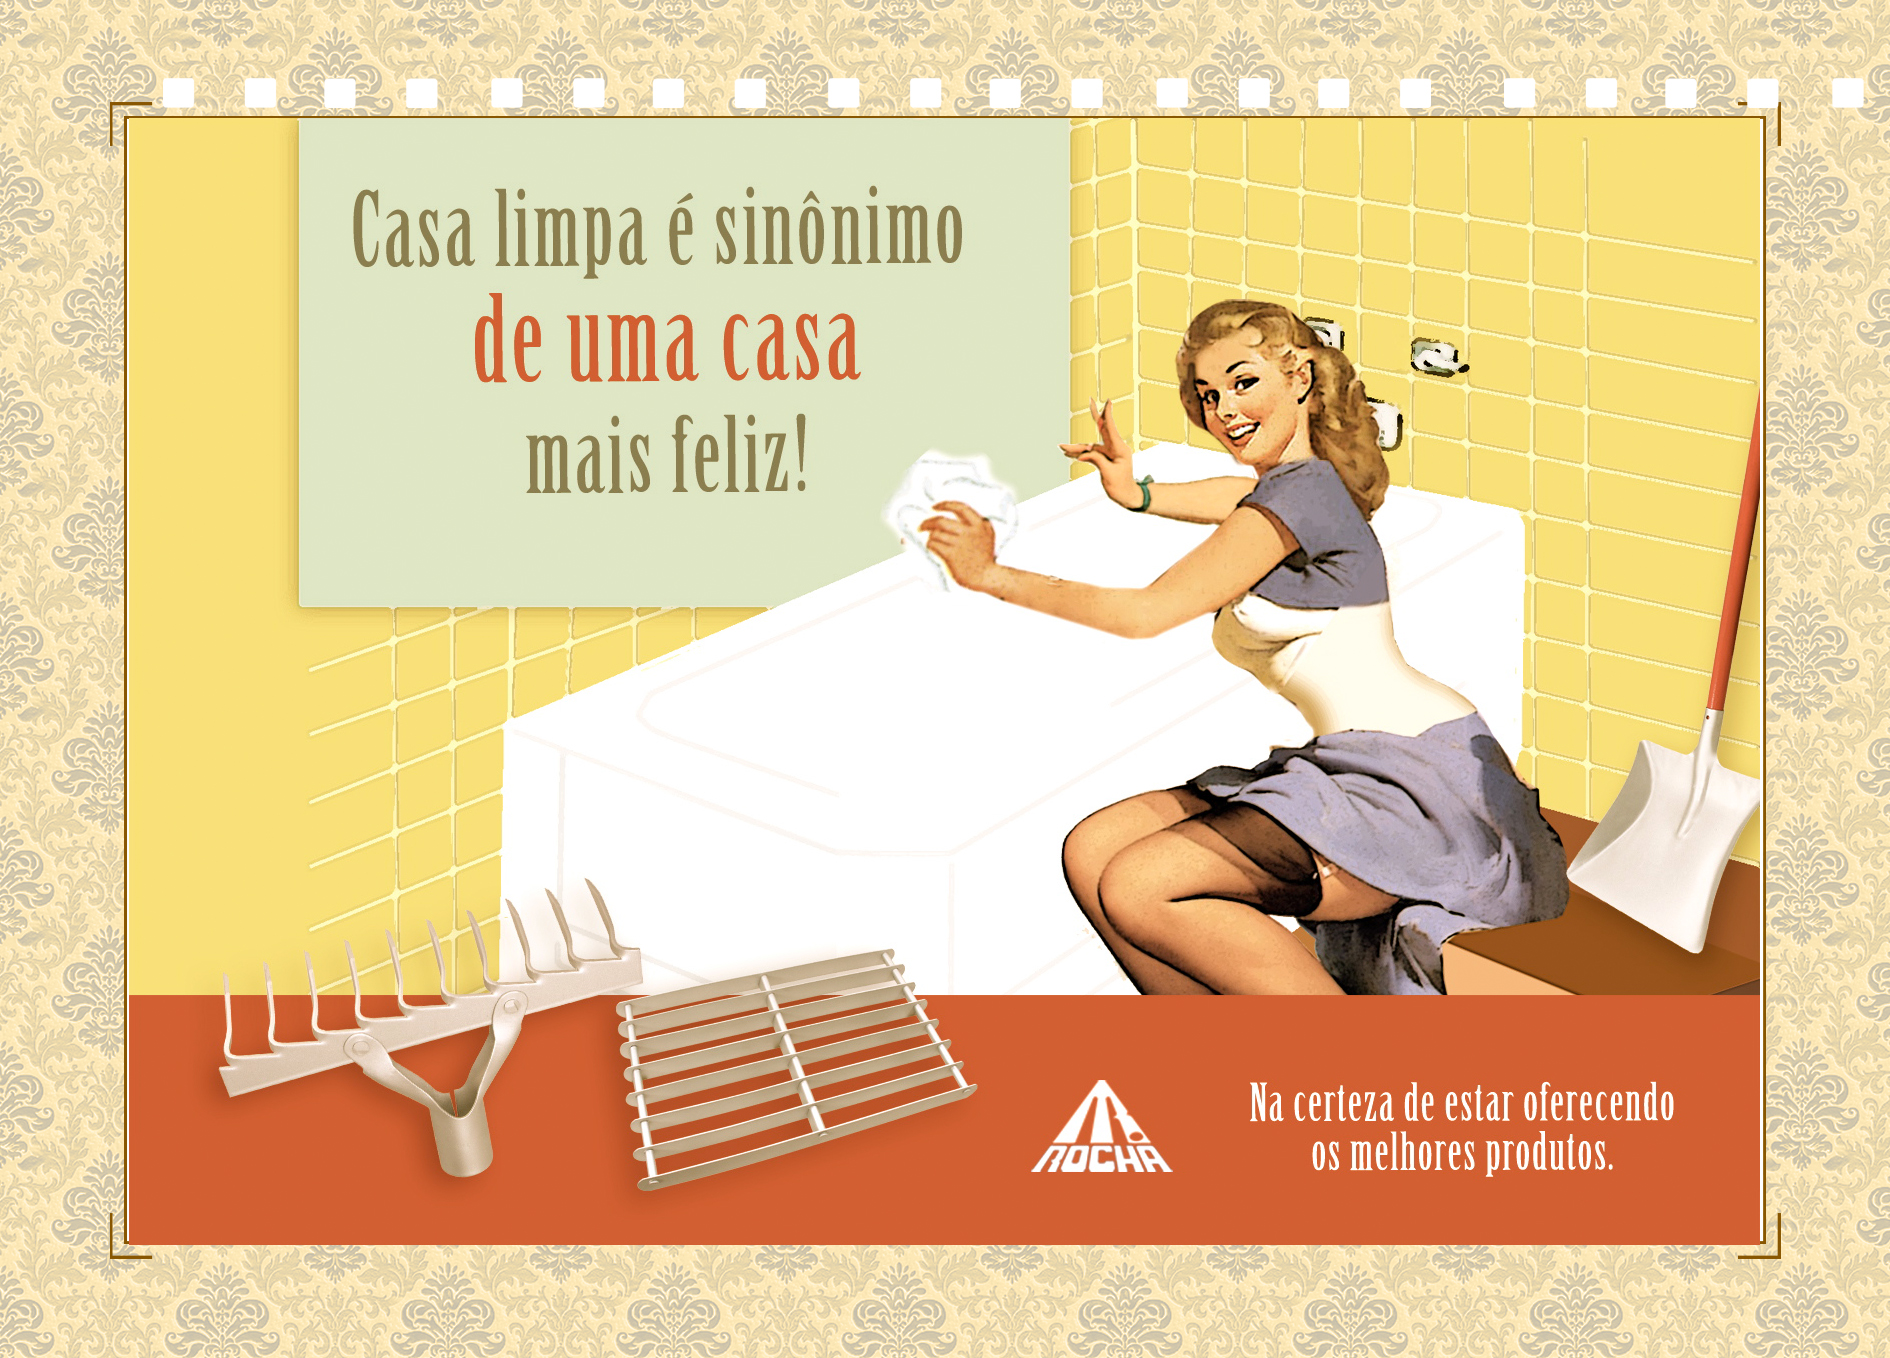 Rocha_6_job_para_A8.jpg